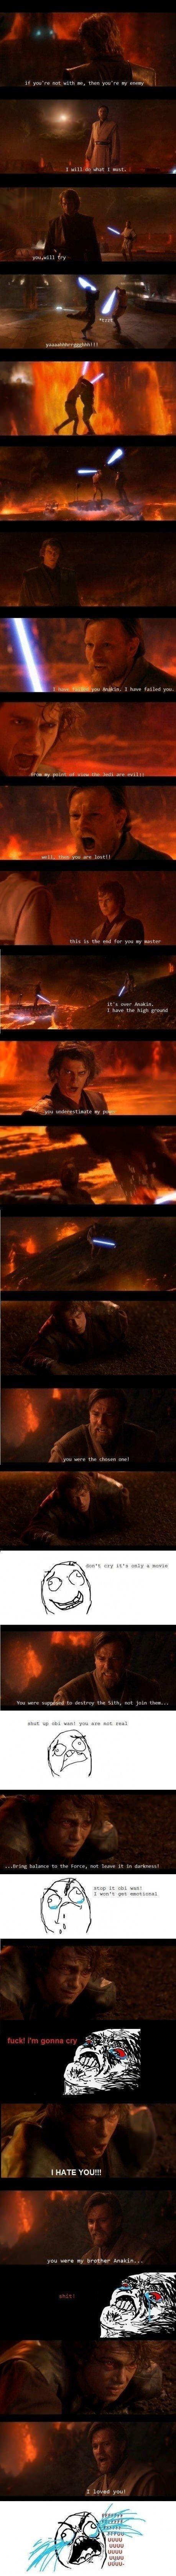 Anakin vs. Obi Wan